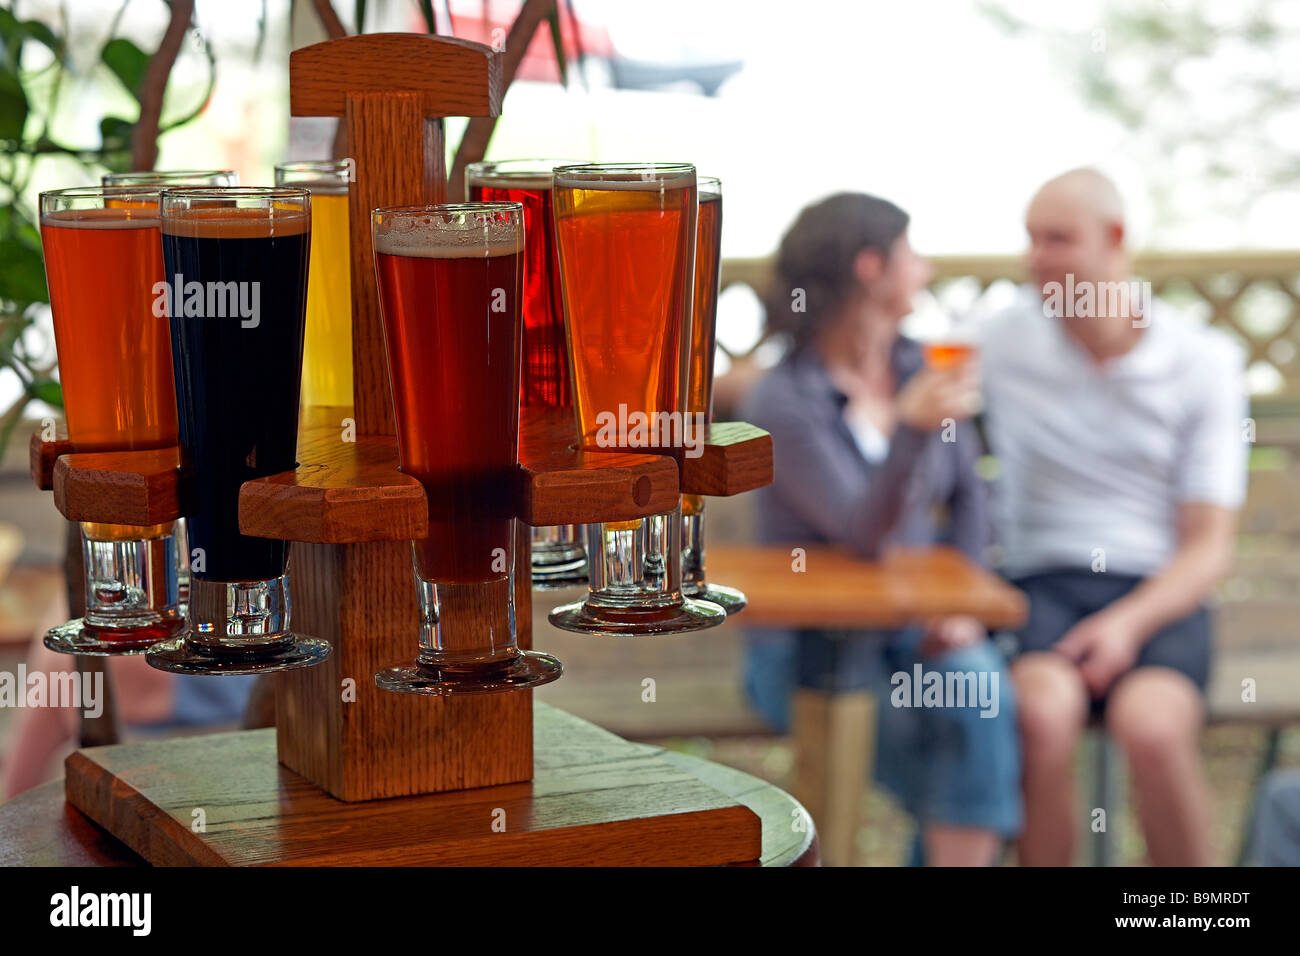 Canada, Quebec Province, Quebec City, Saint-Roch district, la Barberie bar, Biers tasting - Stock Image